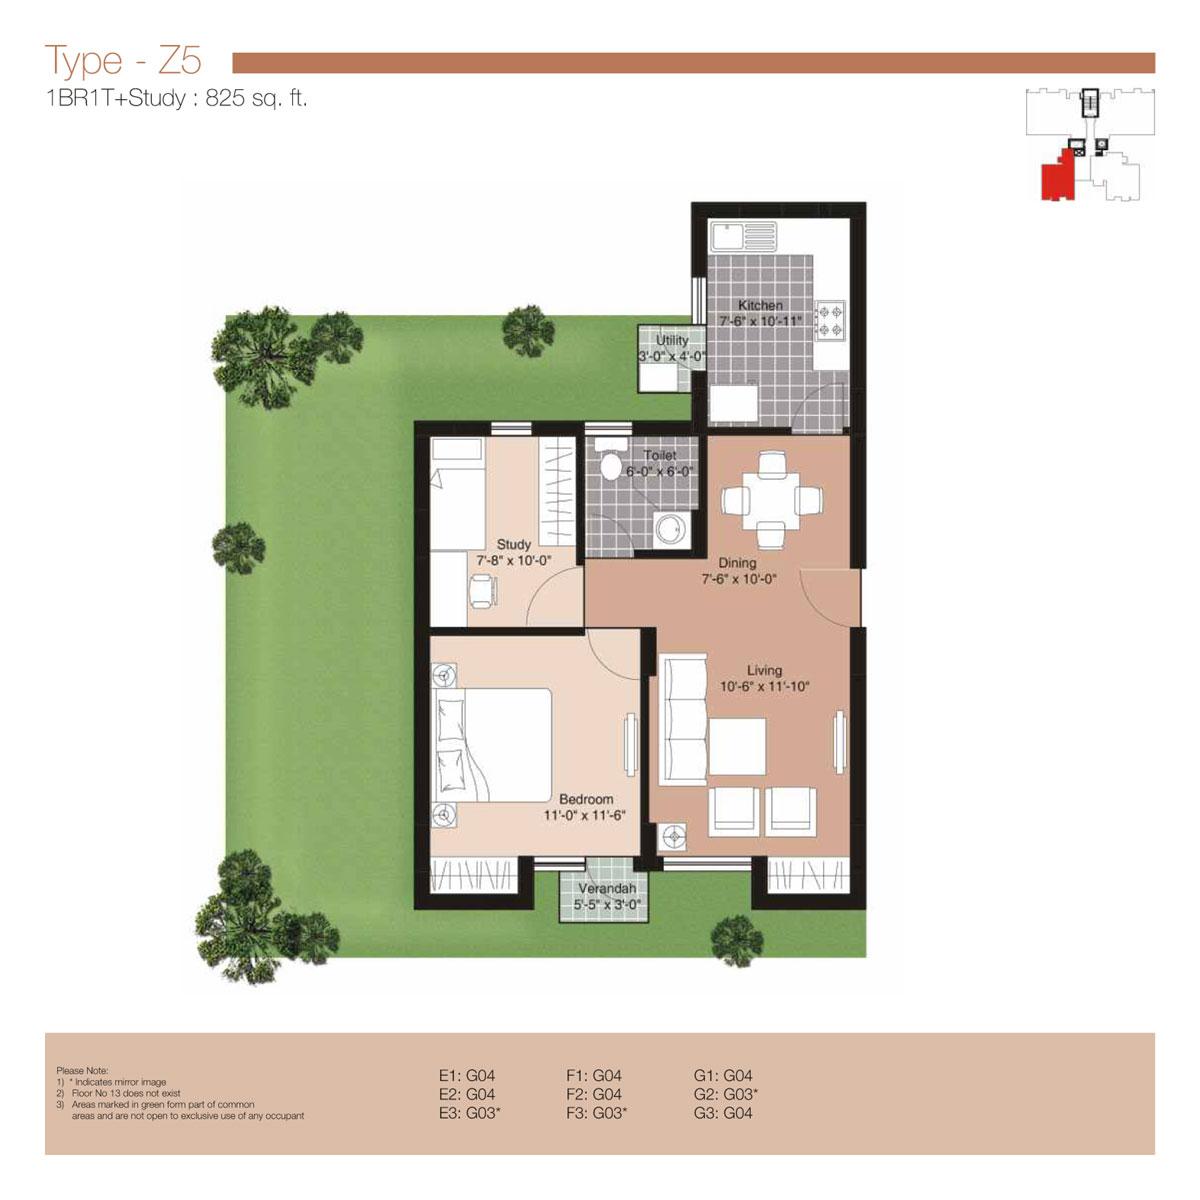 Unitech residences sector 33 sohna road gurgaon for 1 bhk flat floor plan